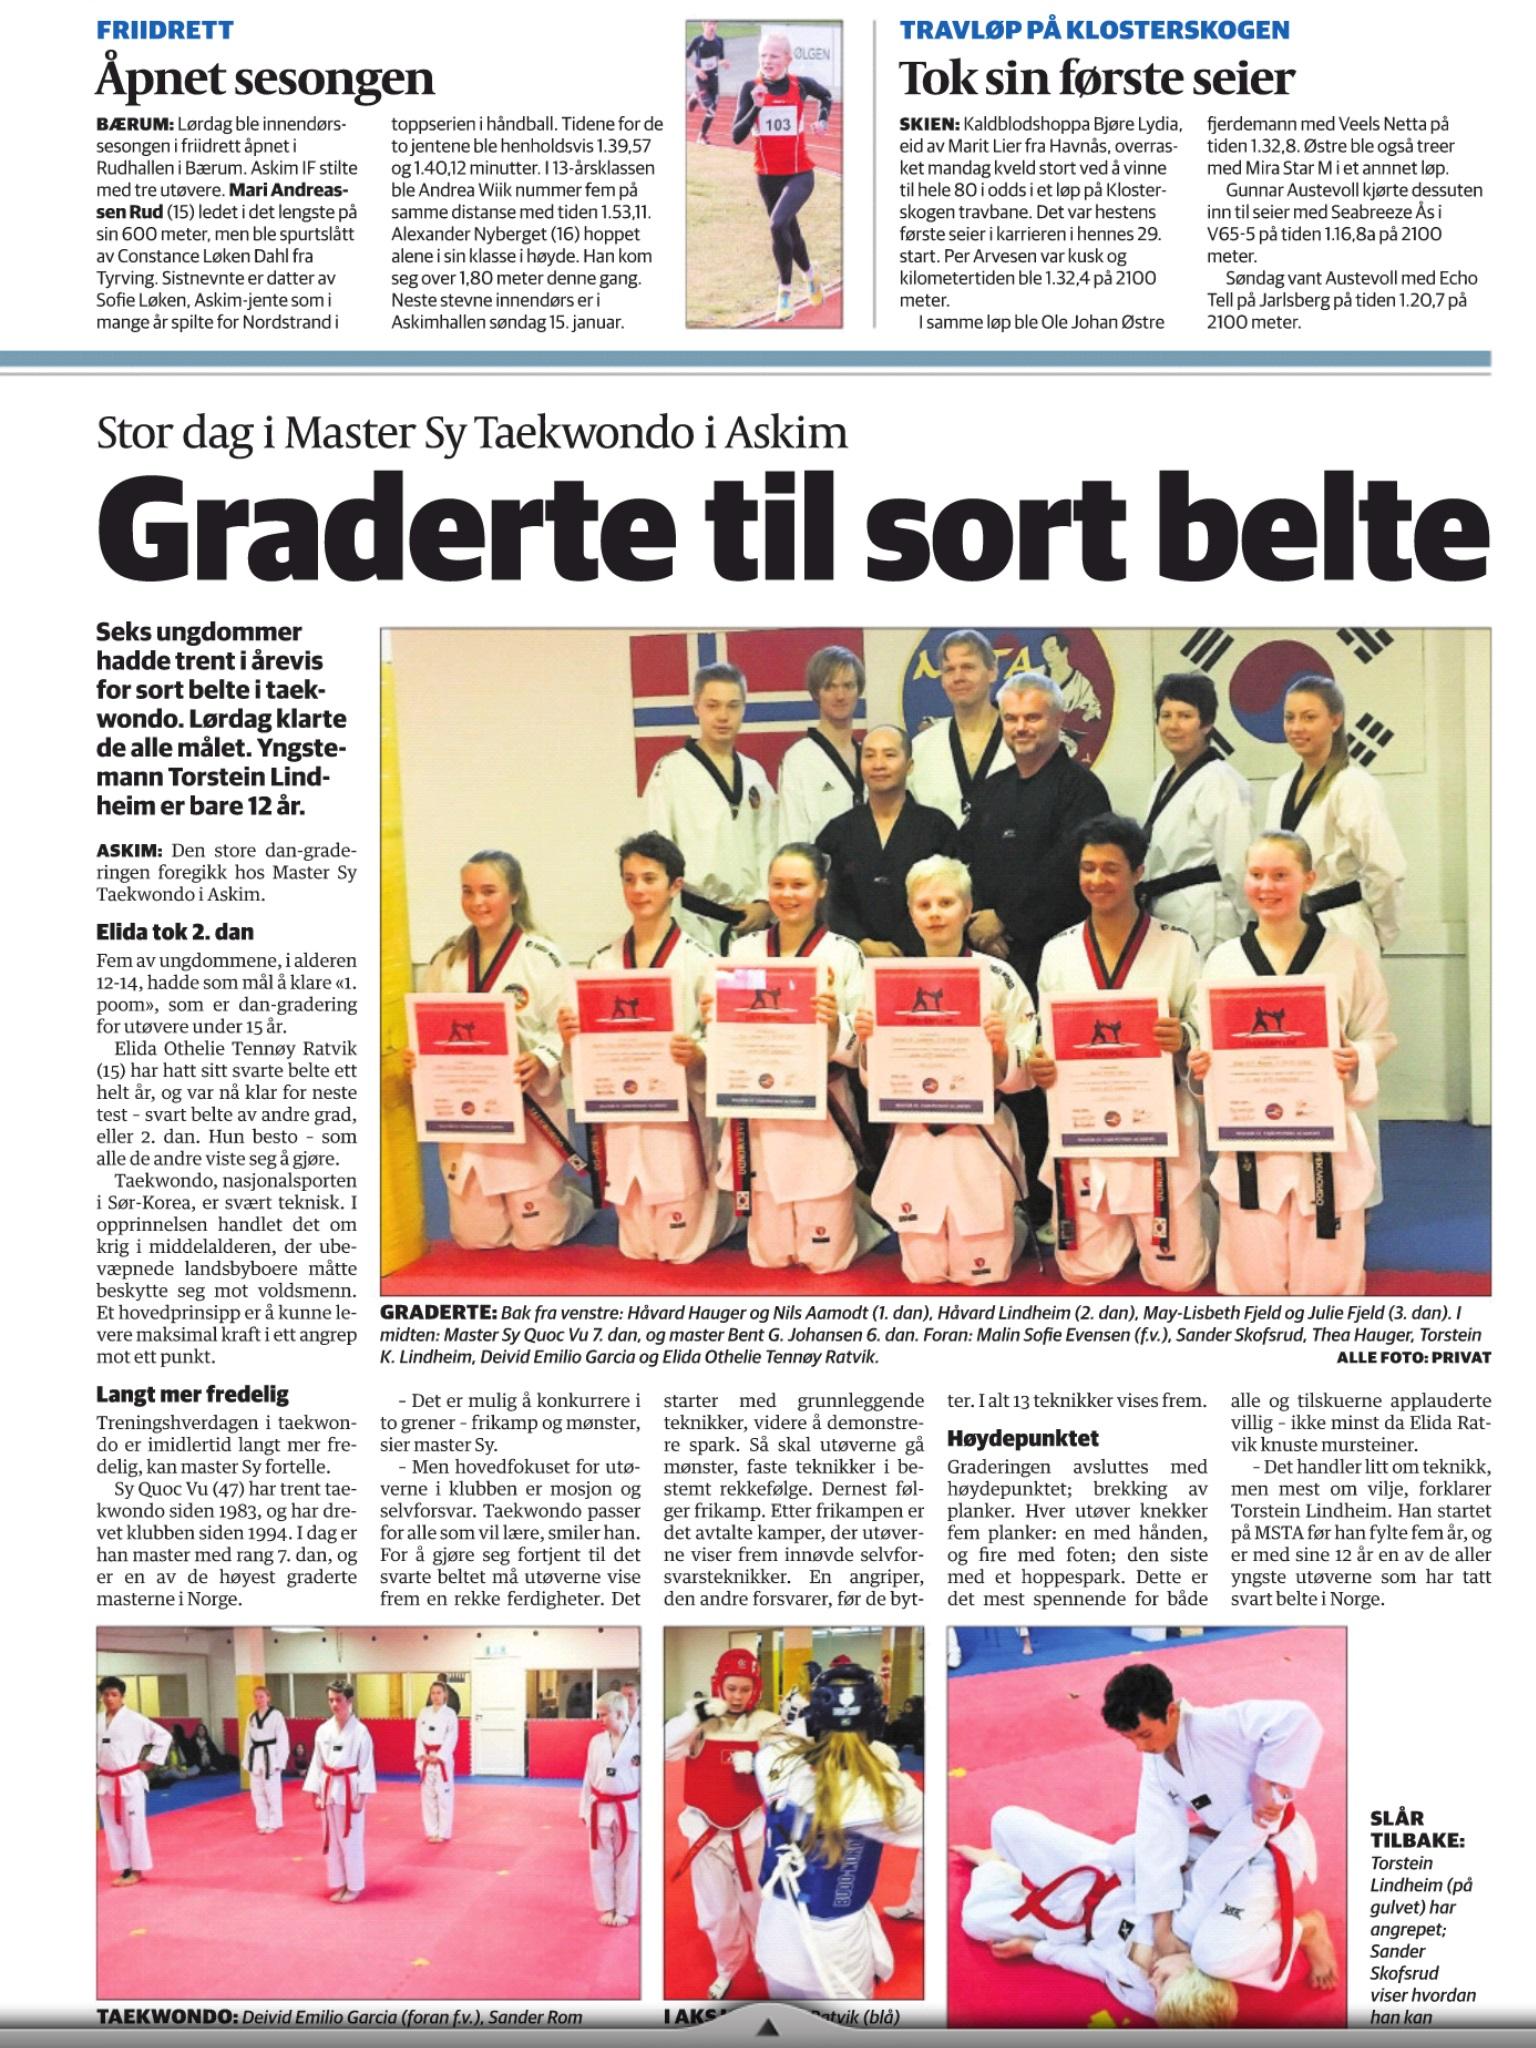 Taekwondo Svartbelte gradering